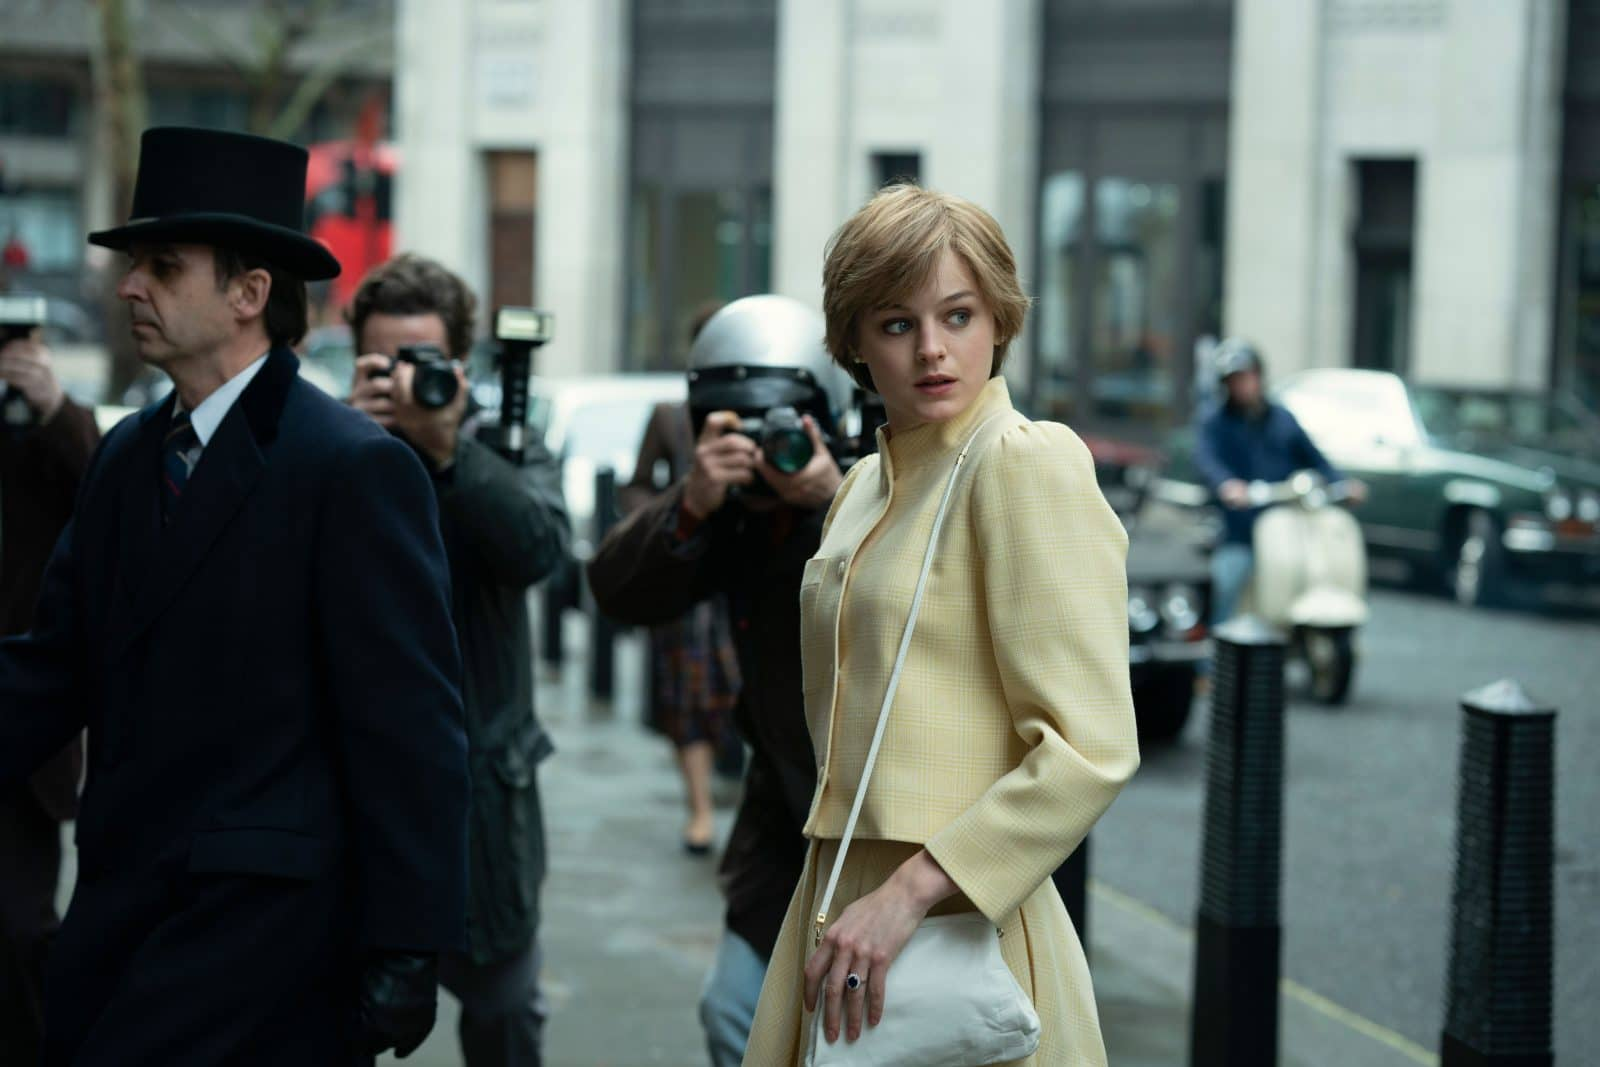 Emma Corrin as Princess Diana in season 4 of The Crown